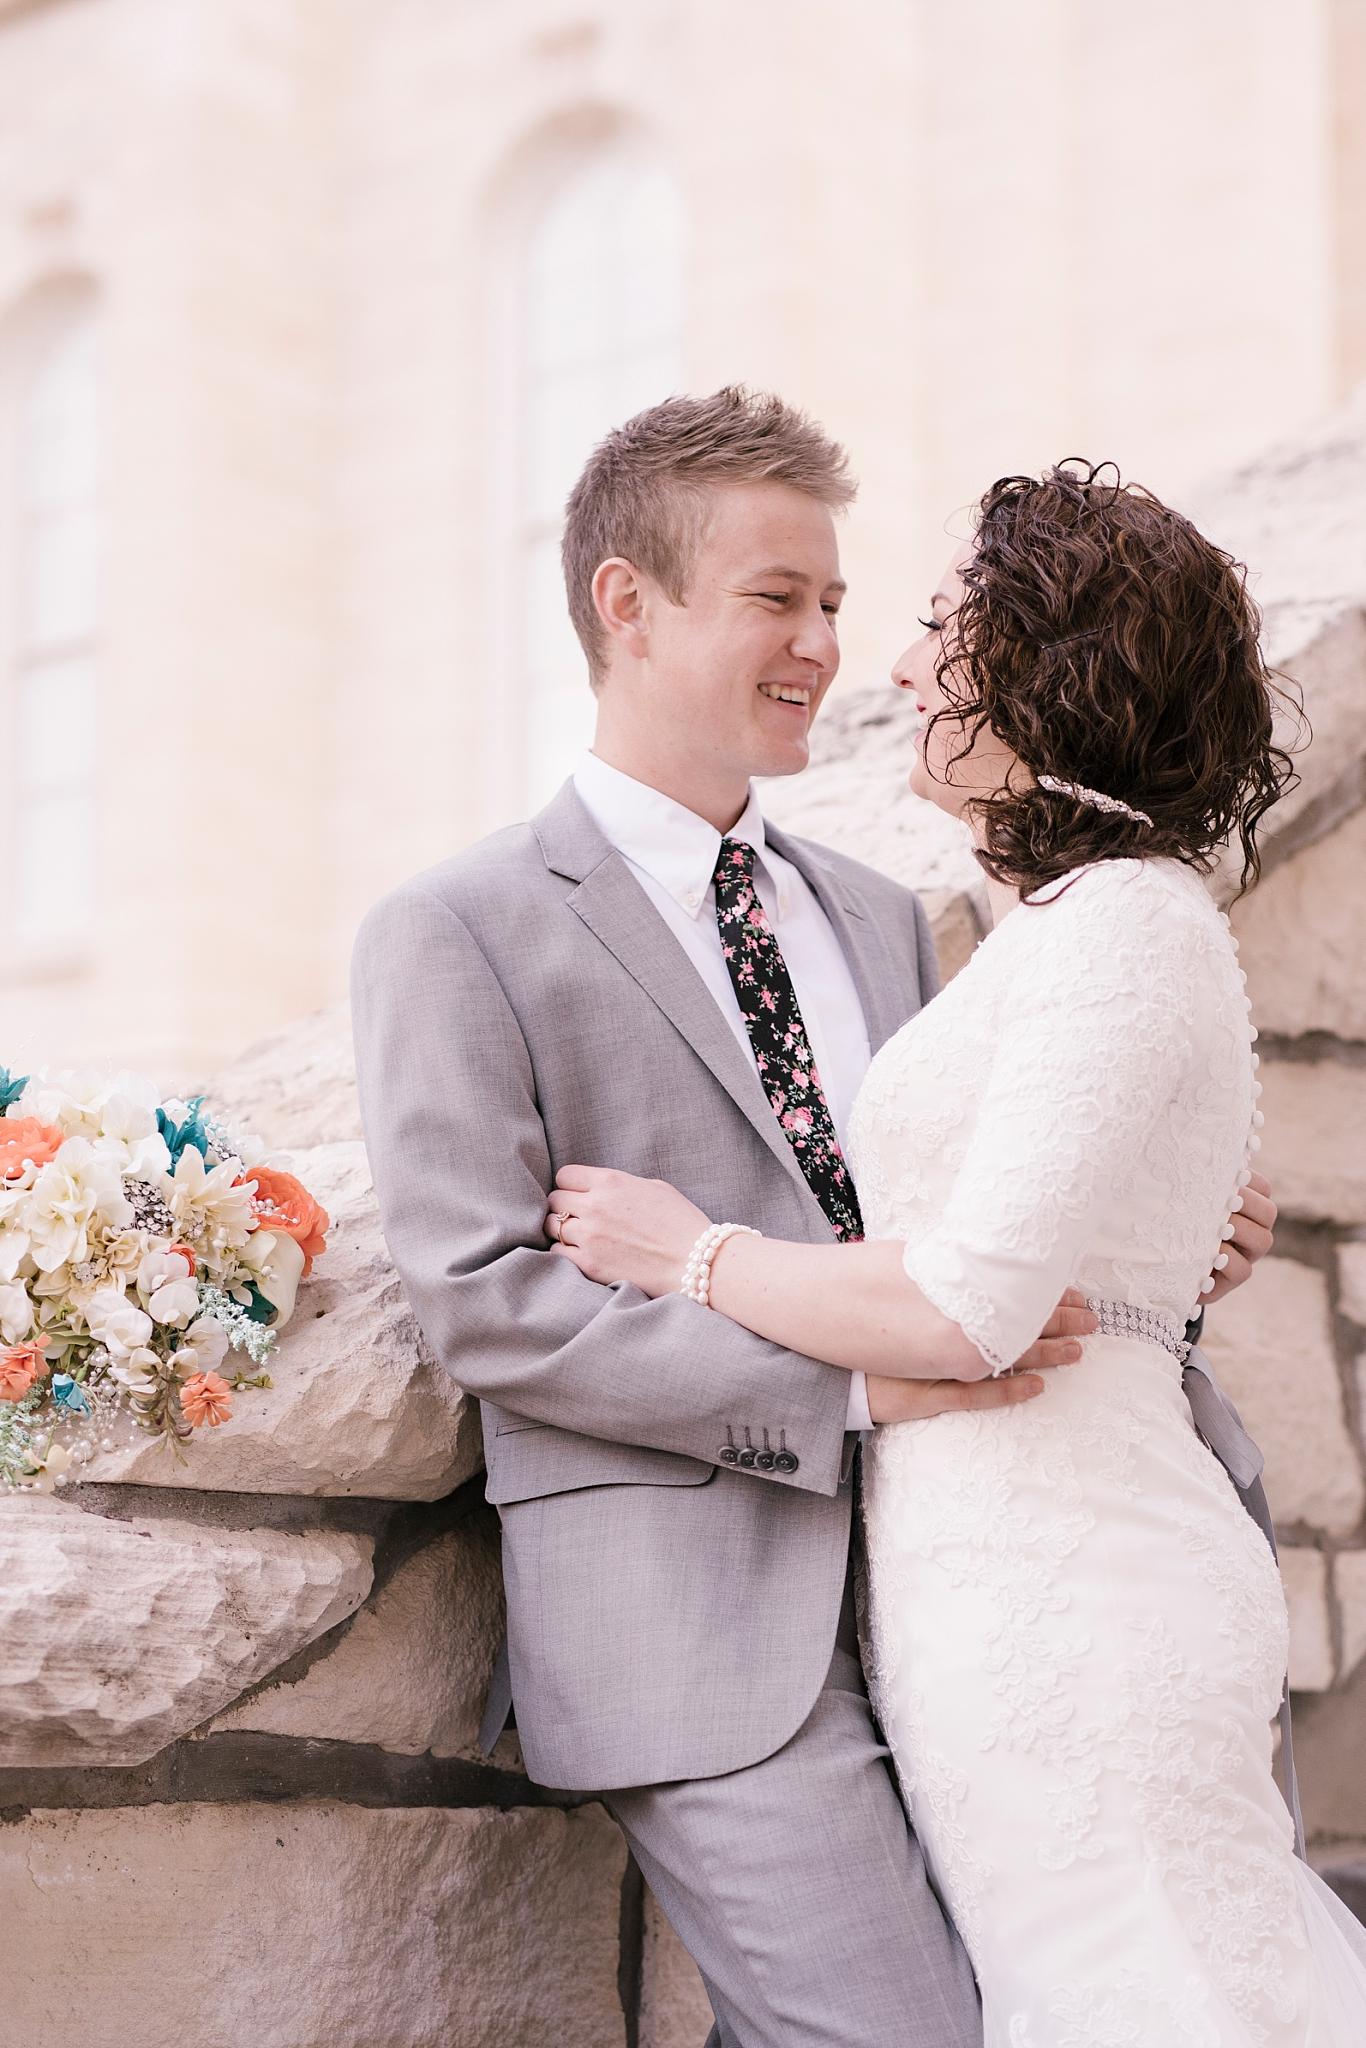 BA-Bridals-153_Lizzie-B-Imagery-Utah-Wedding-Photographer-Engagement-Photography-Salt-Lake-City-Park-City-Utah-County-Manti-Utah-Temple.jpg